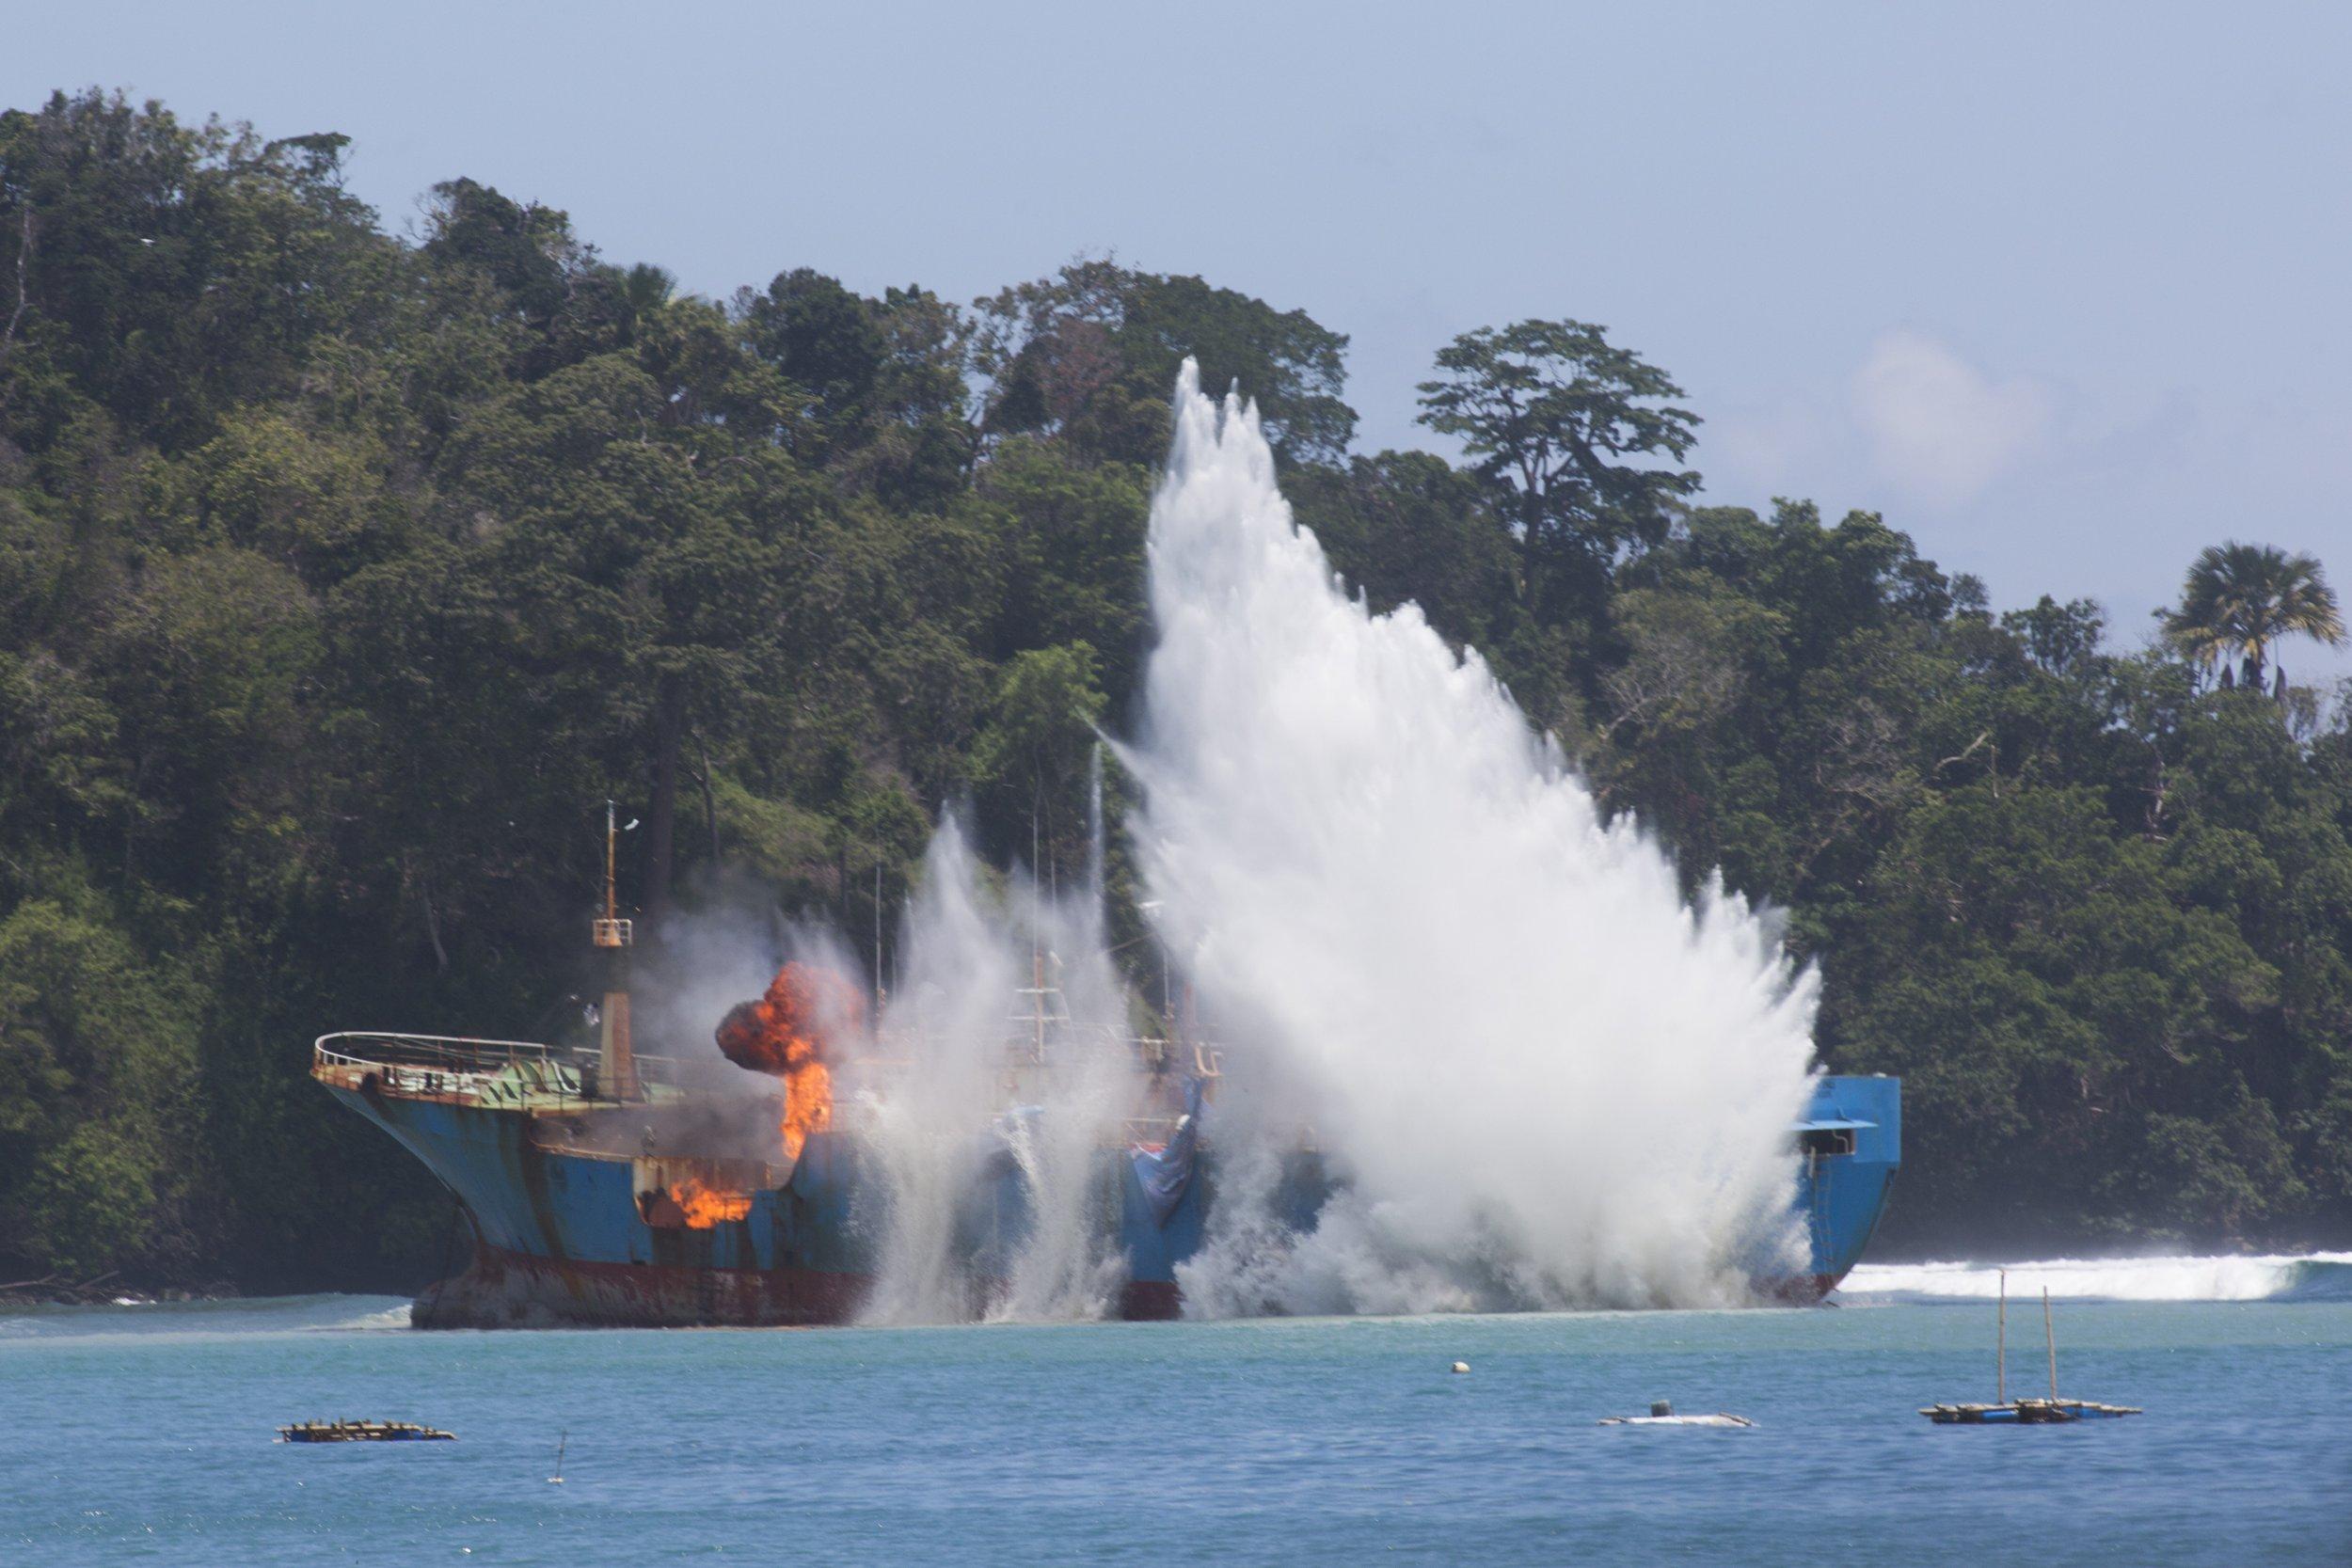 Viking-ship-exploded